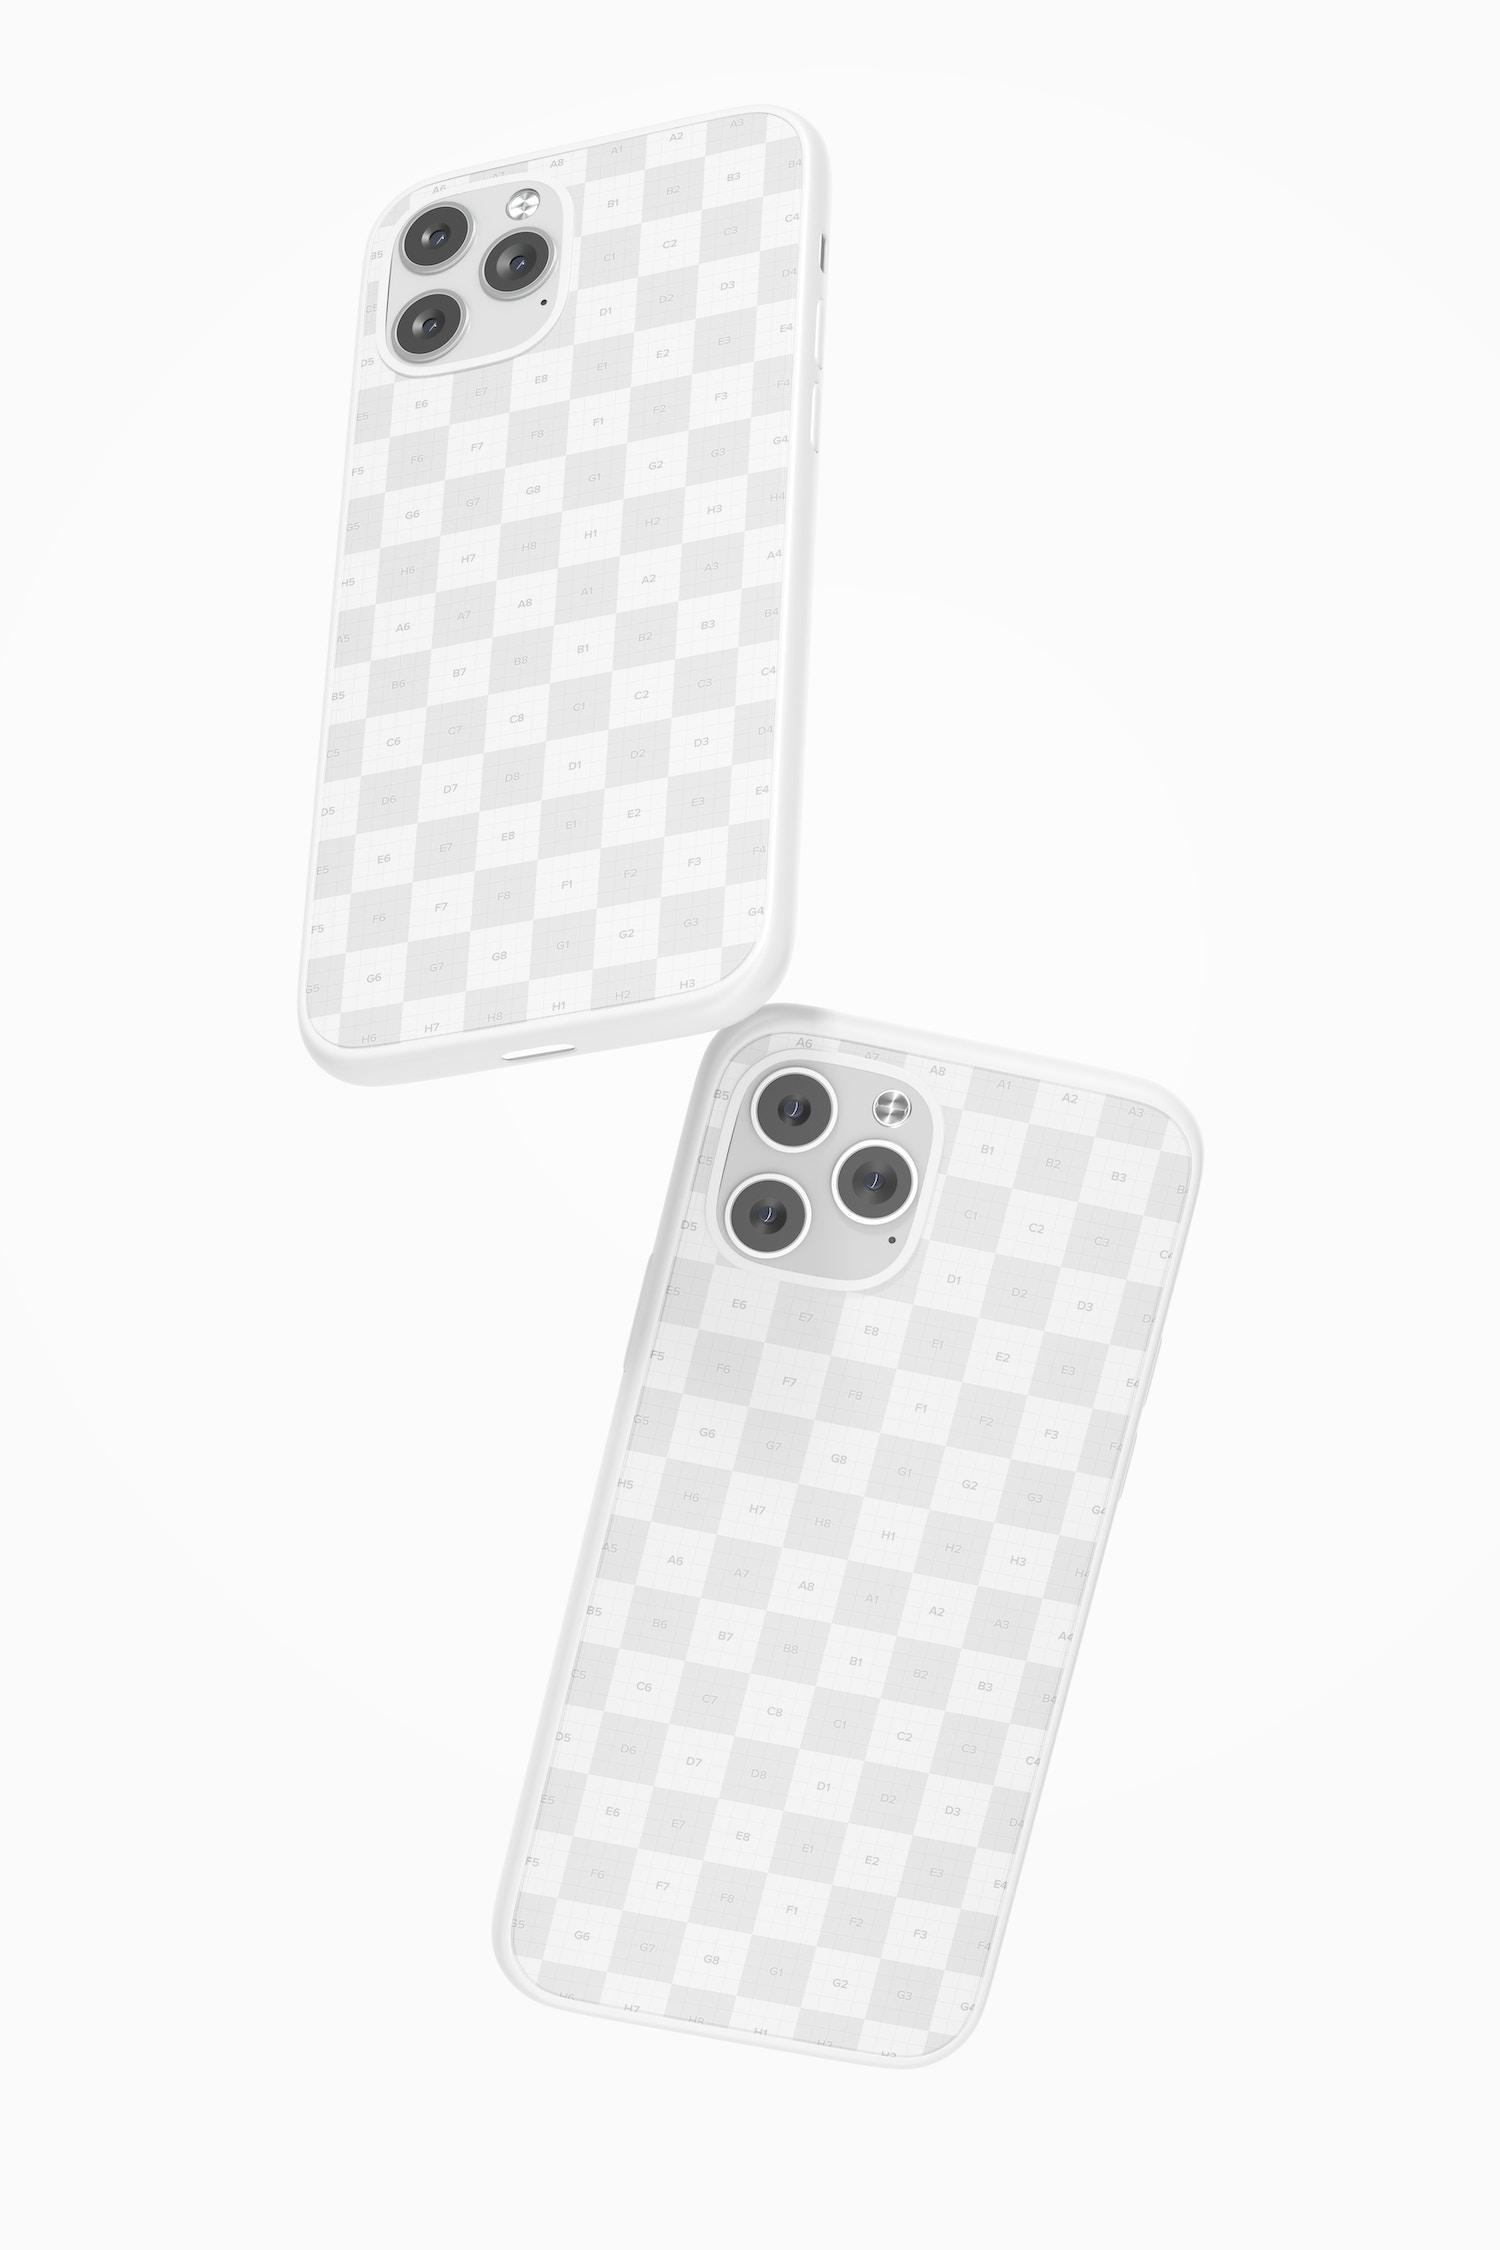 iPhone 12 Plastic Cases Mockup, Falling